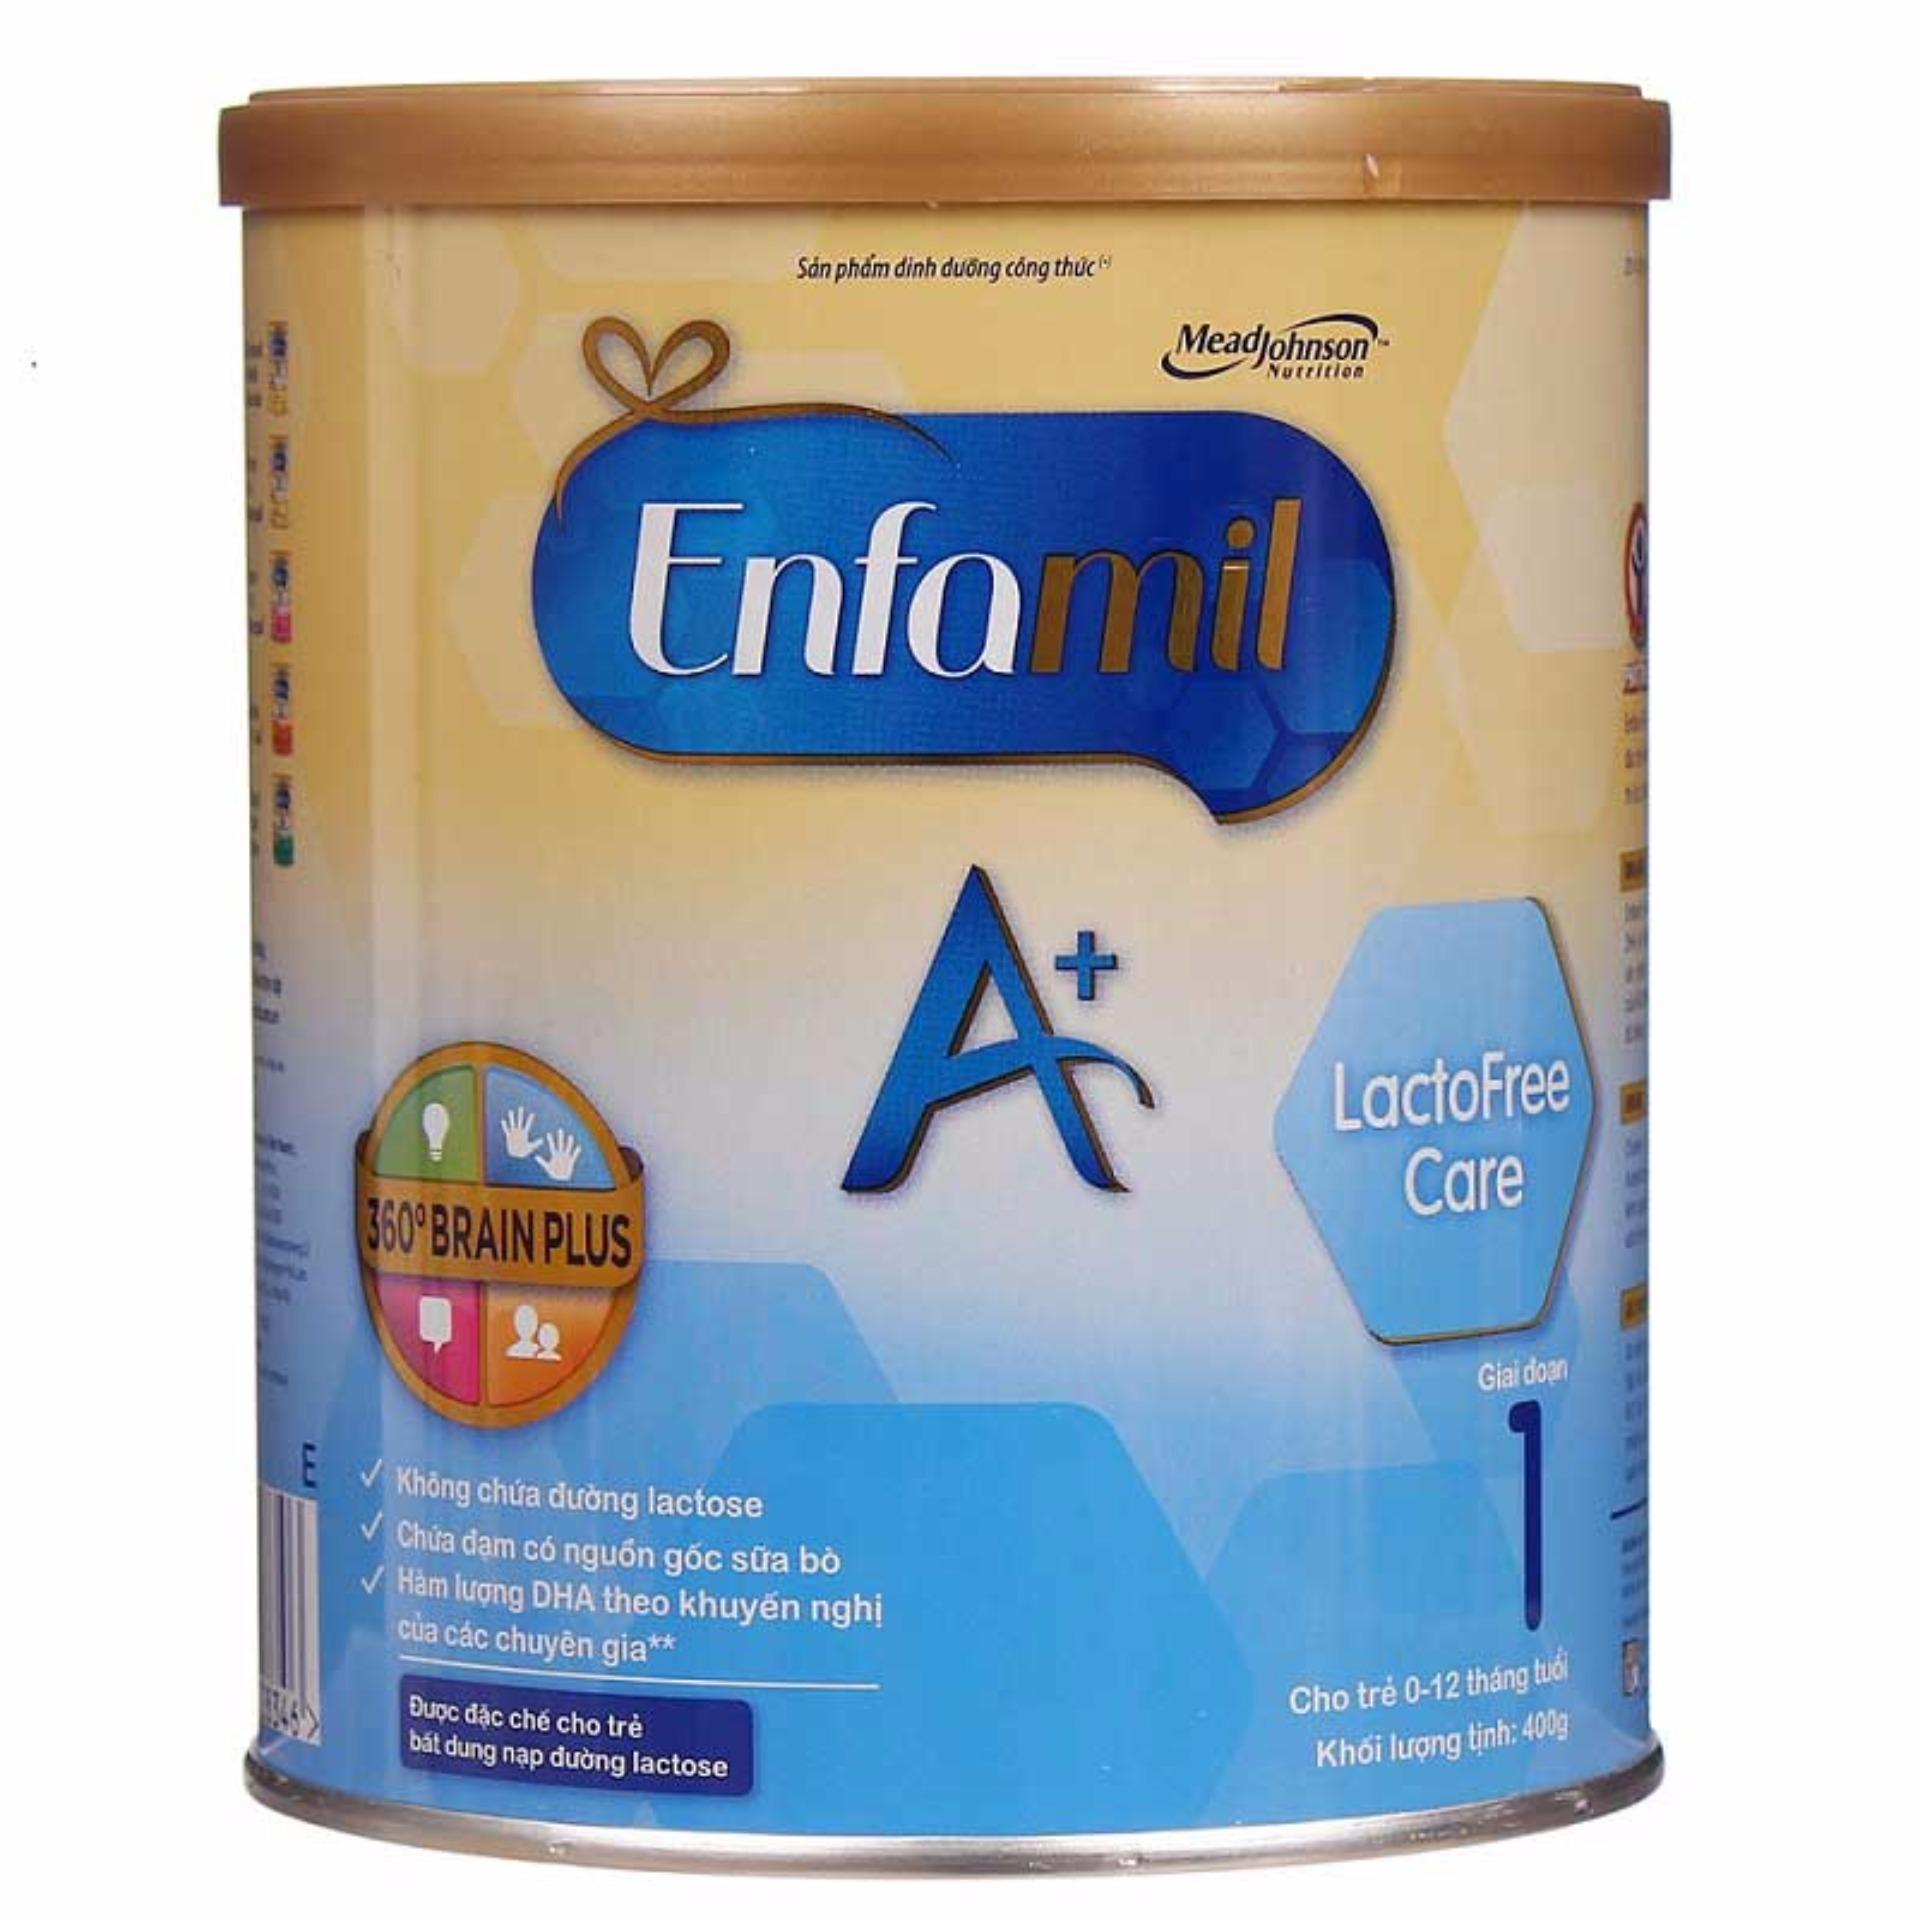 Sữa bột Enfamil A+ Lactofree 360o Brain Plus 400g